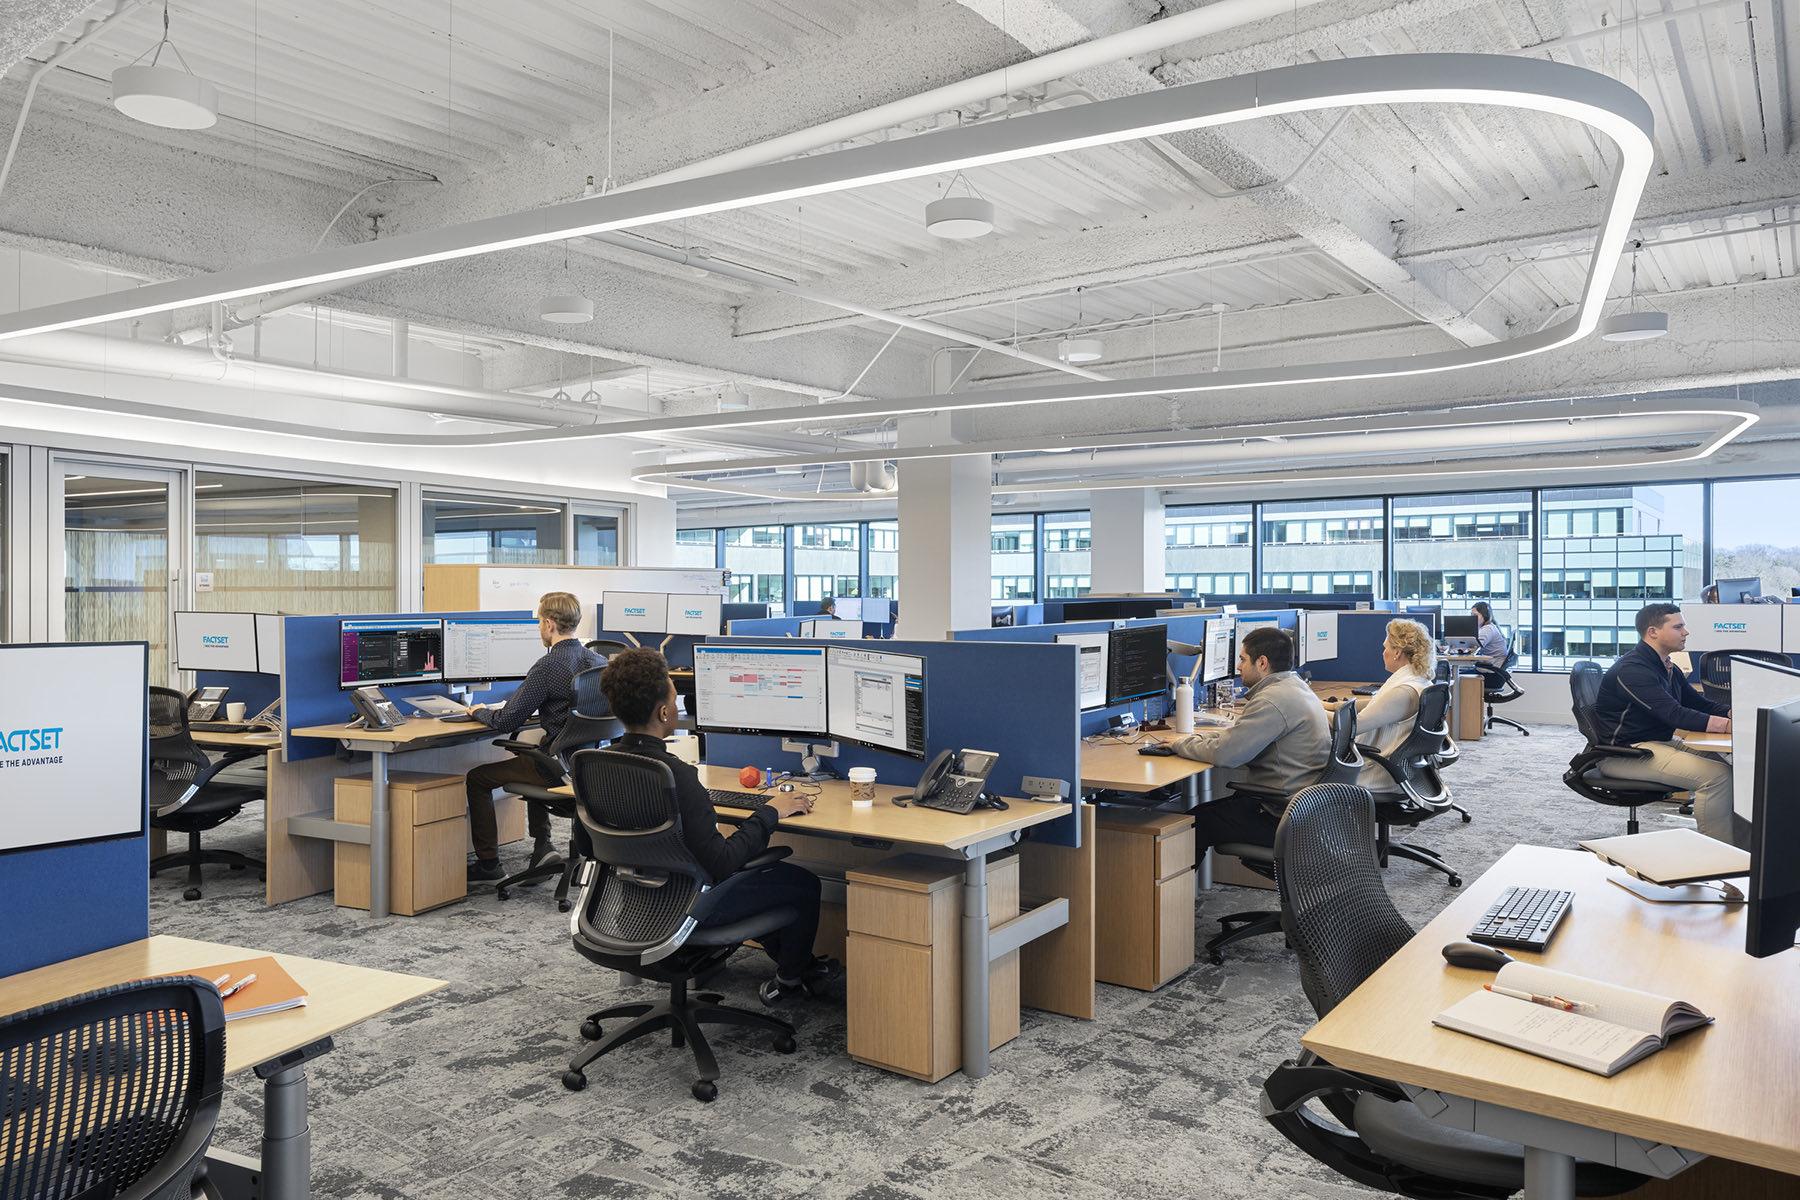 factset-norwalk-office-12